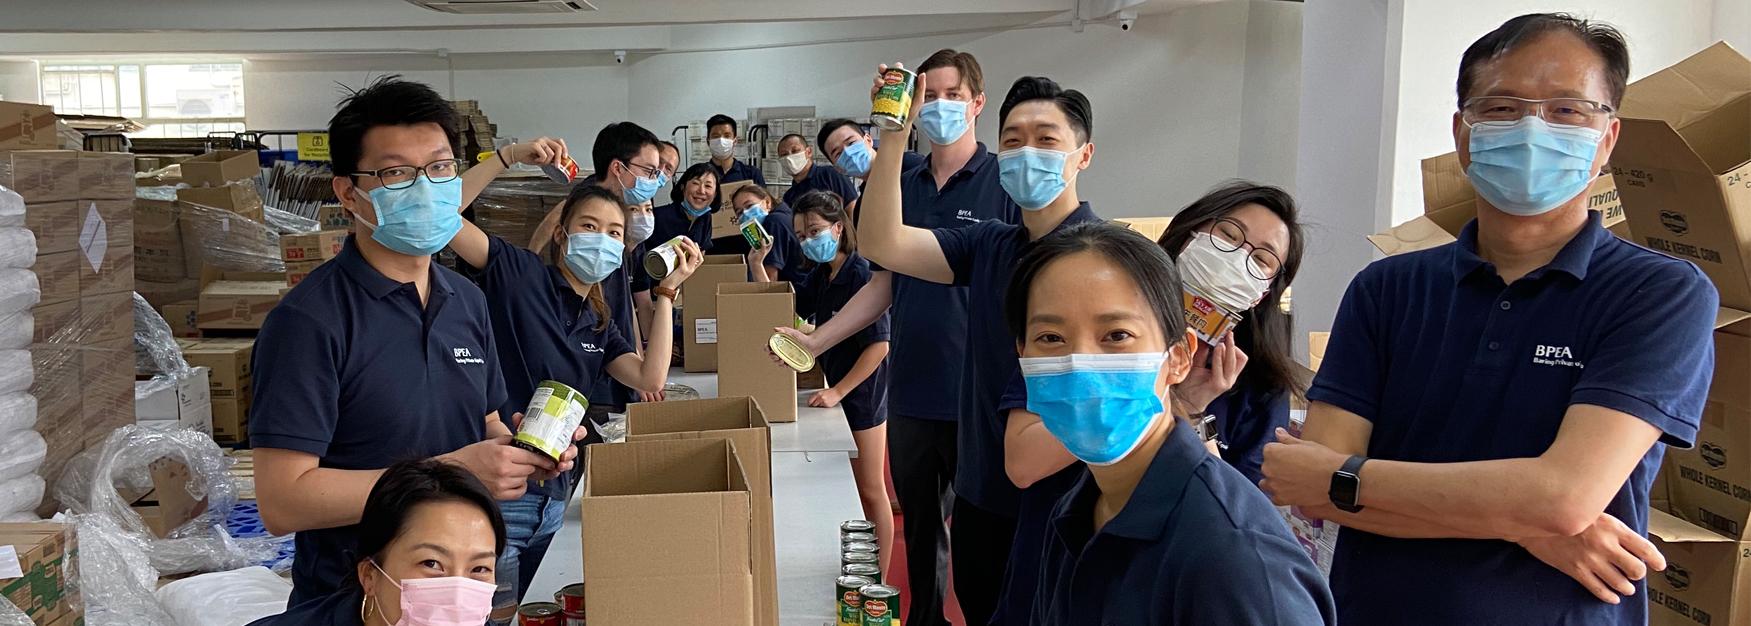 Corporate Volunteering BPEA